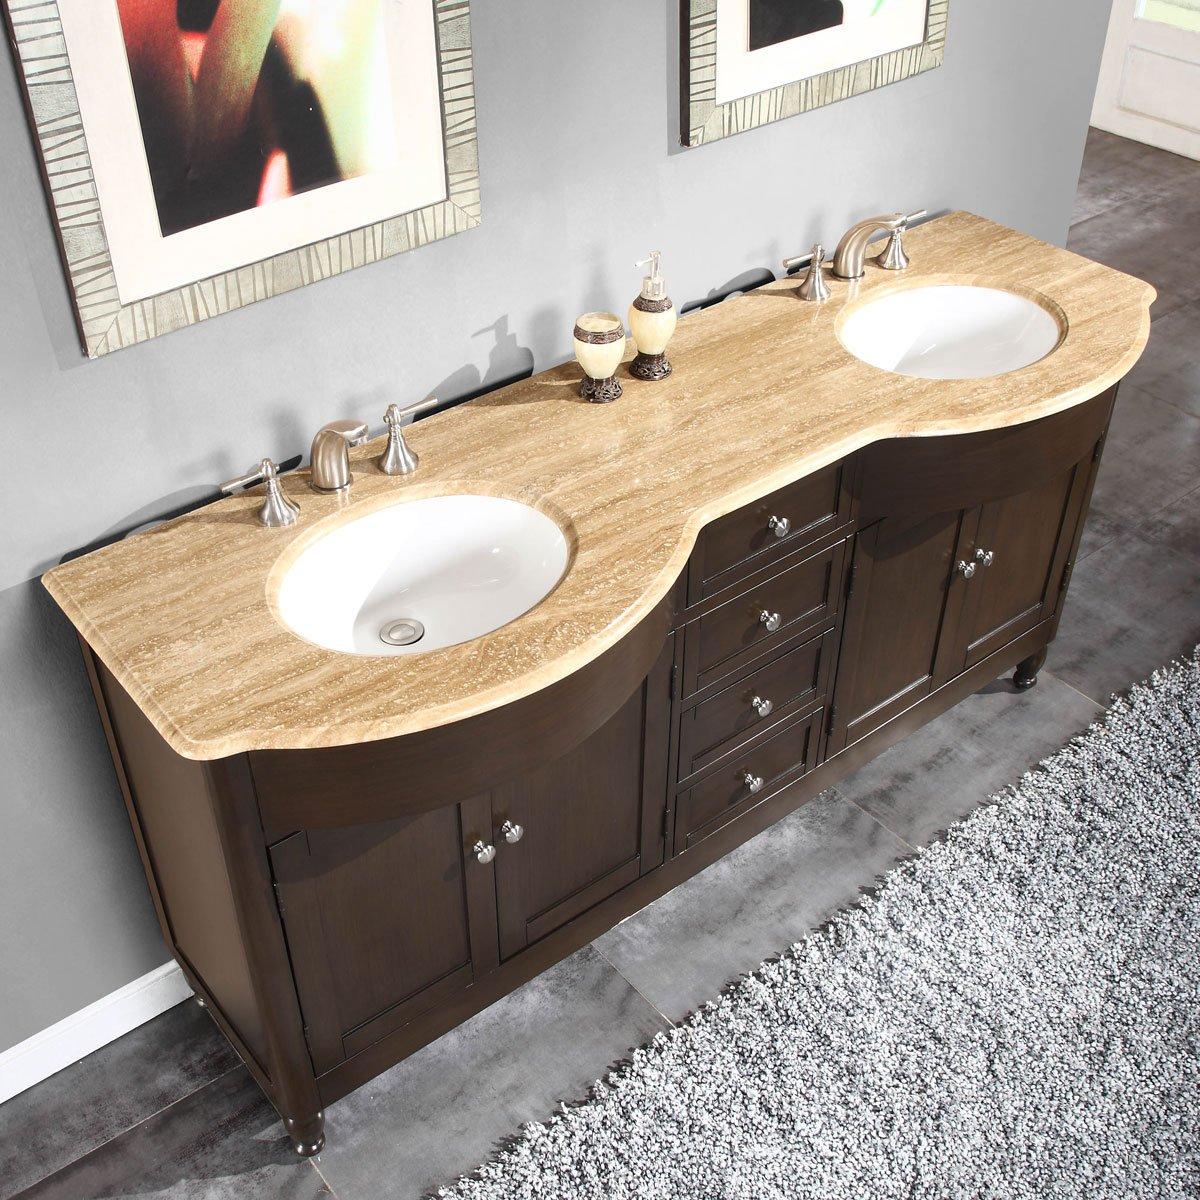 Silkroad Exclusive 72 Inch Travertine Stone Top Bathroom Double Sink